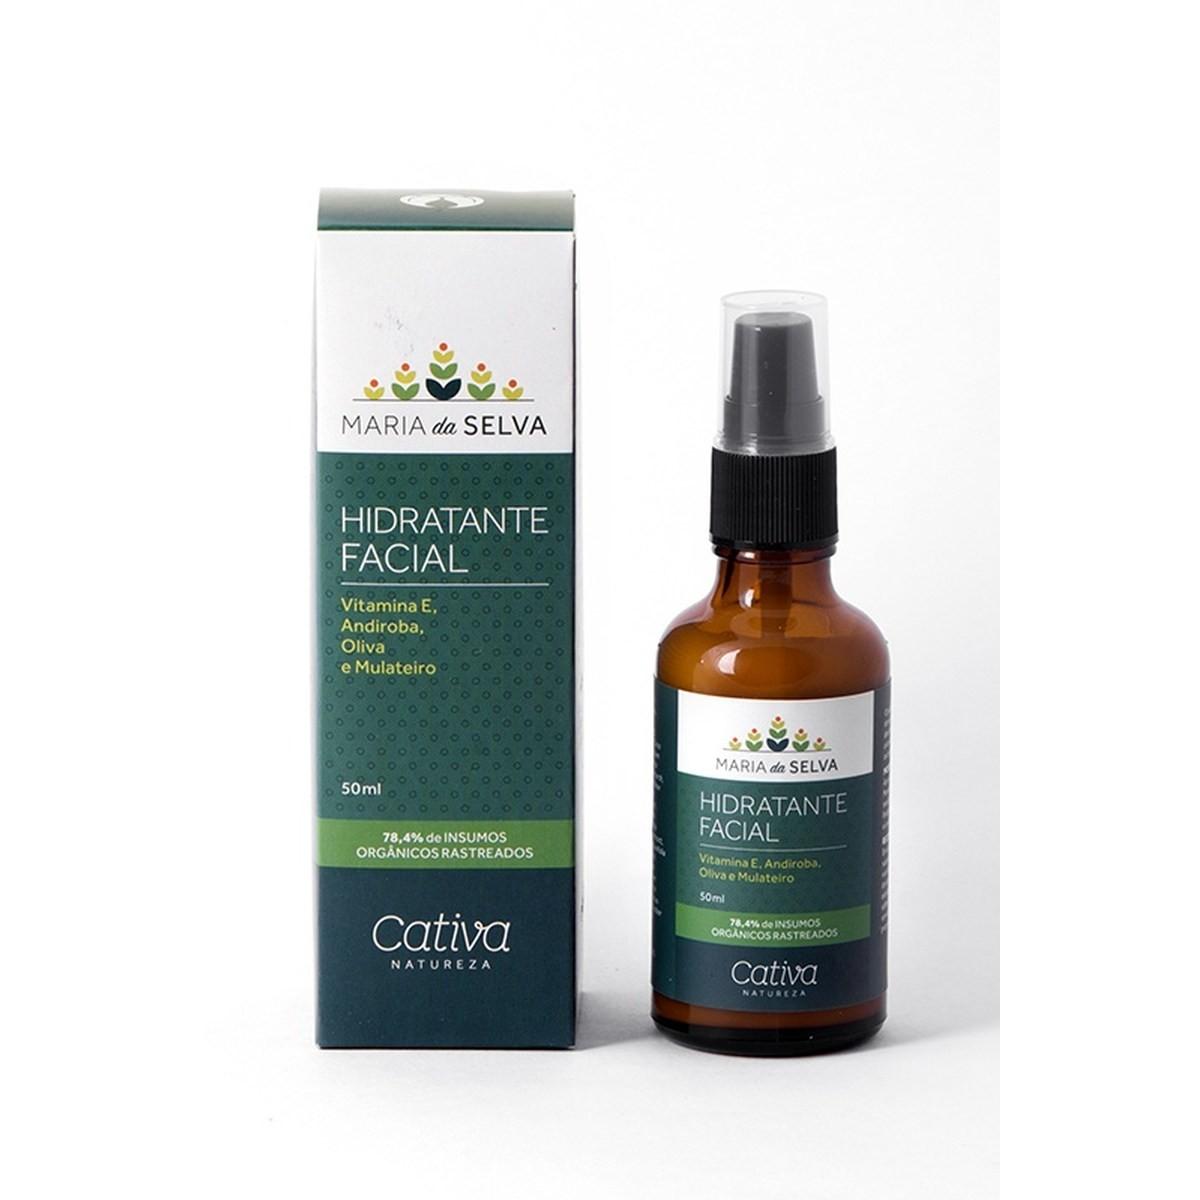 Hidratante Facial Maria da Selva Natural e Vegano Cativa Natureza 50 ml